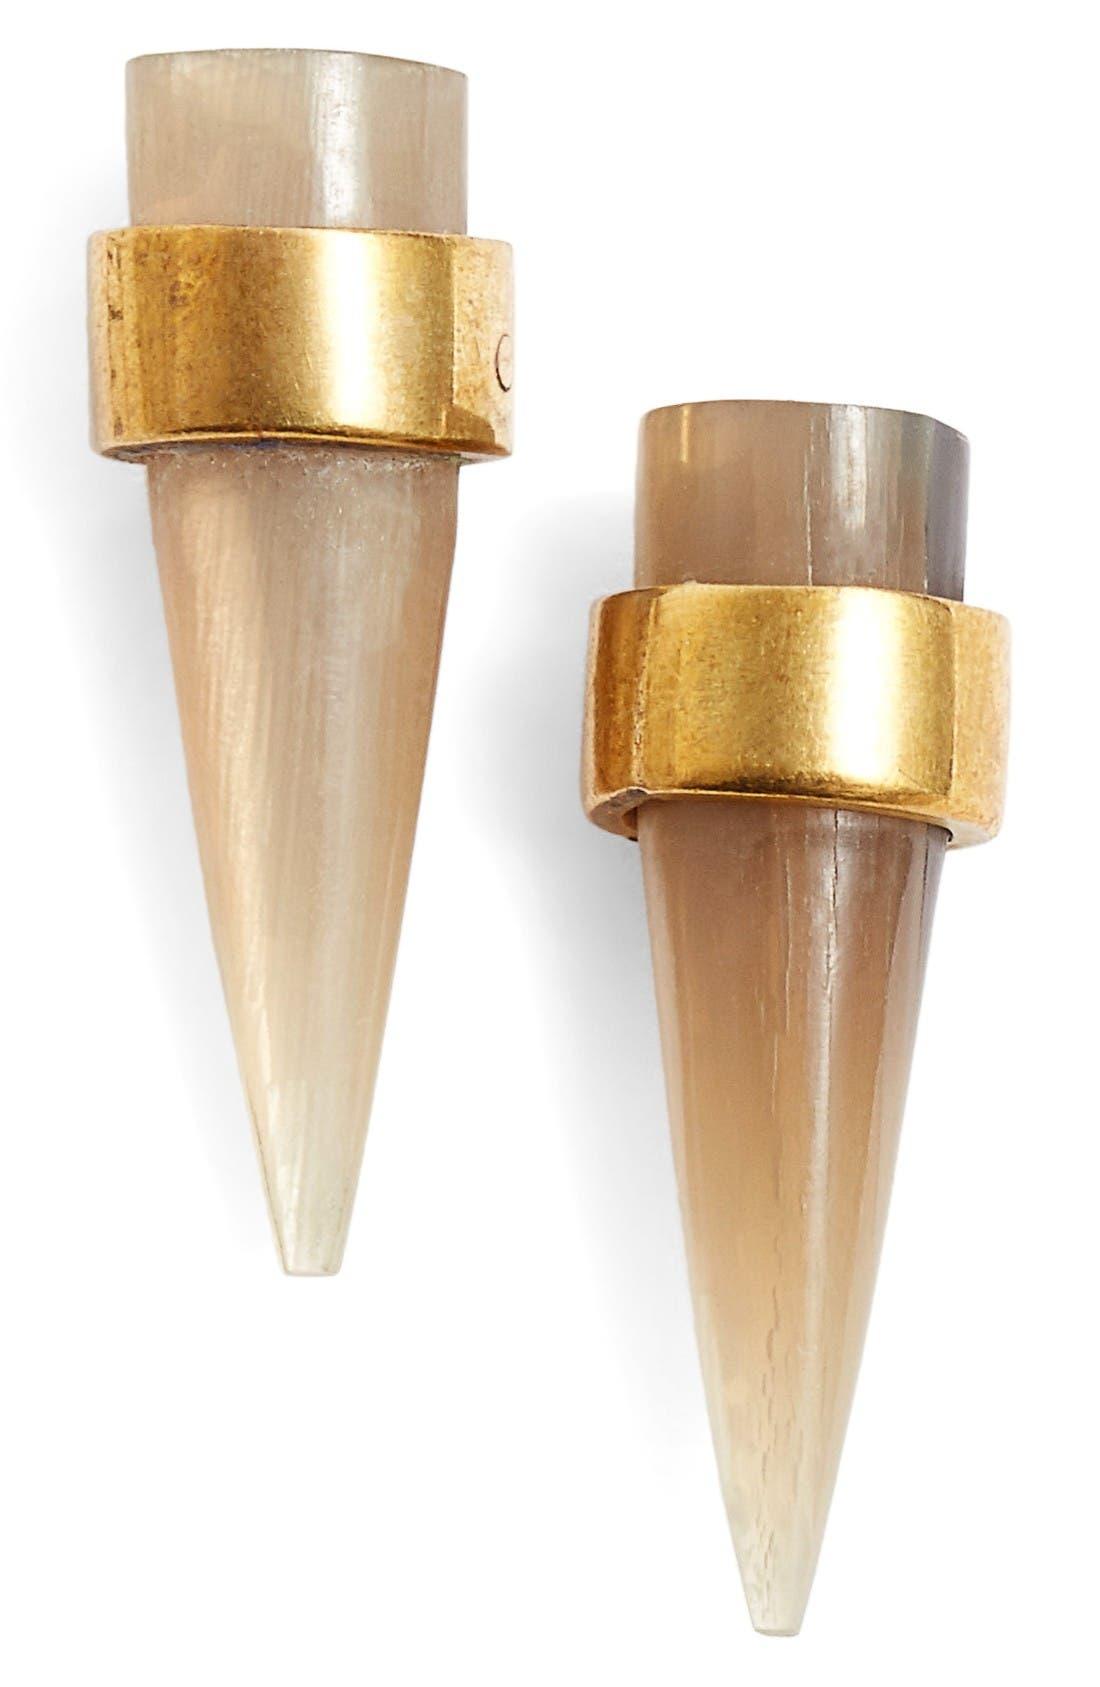 Kili Stud Earrings,                         Main,                         color, Natural